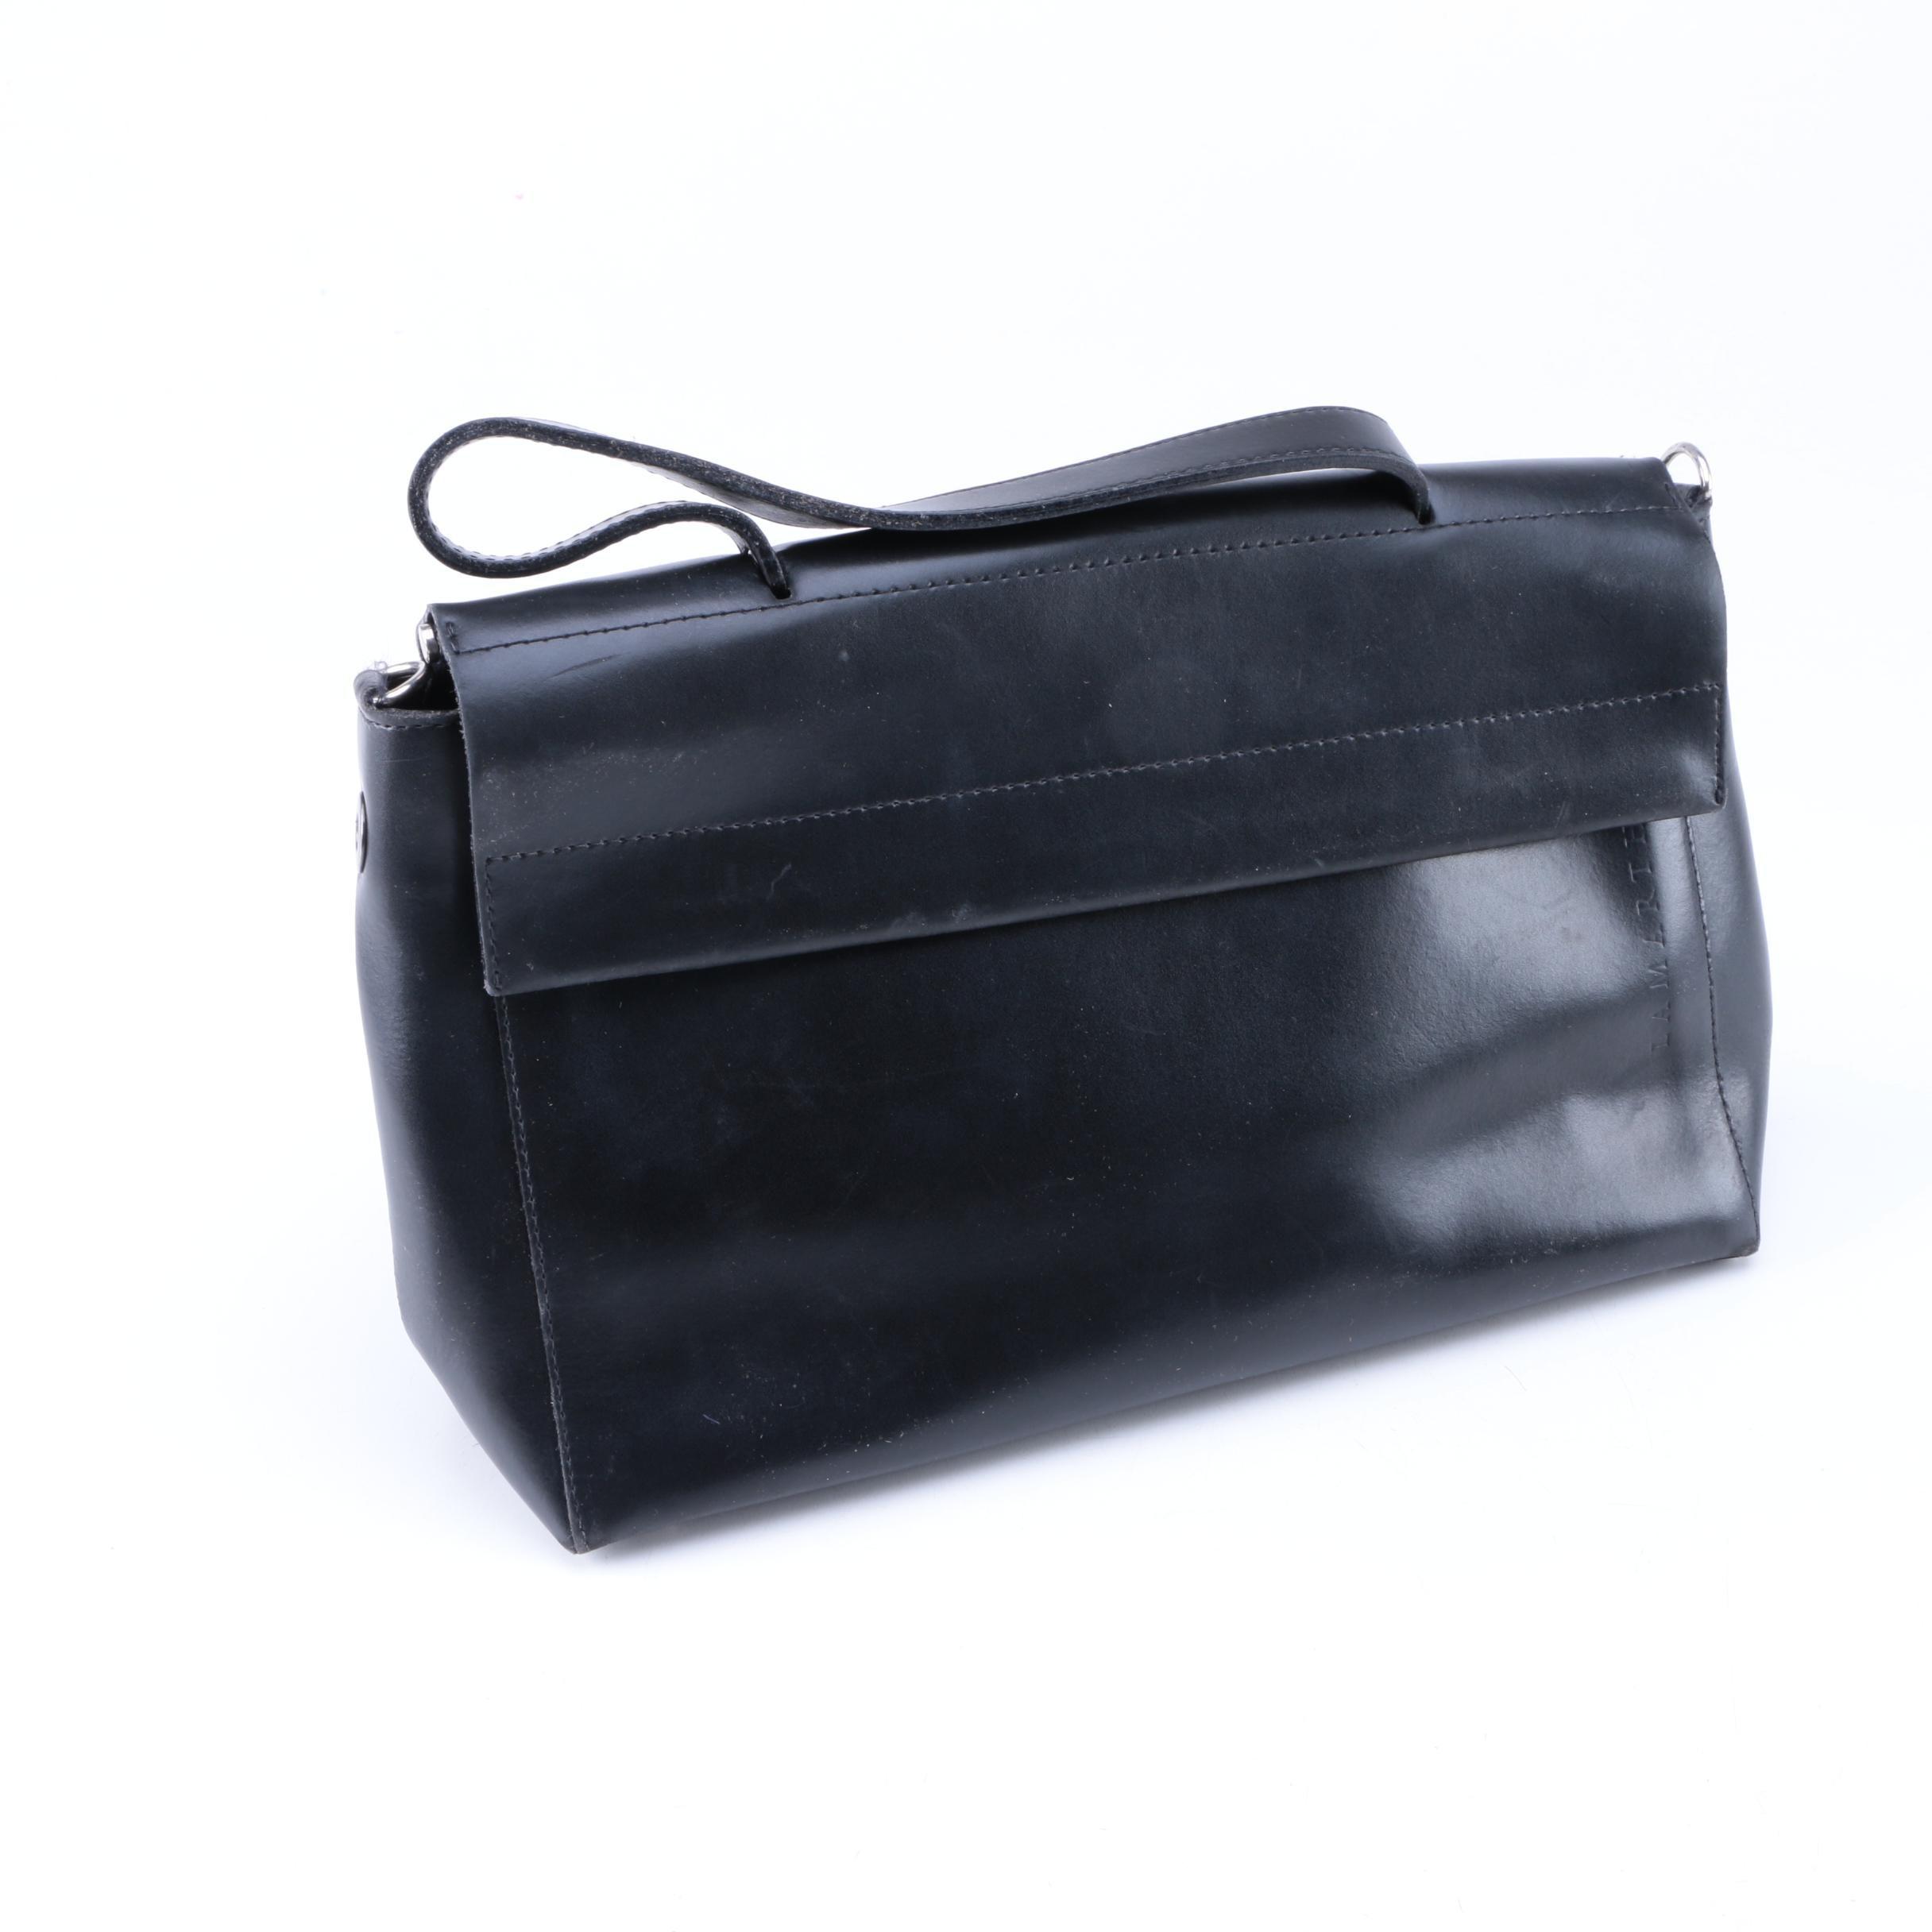 Lamarthe Black Leather Handbag